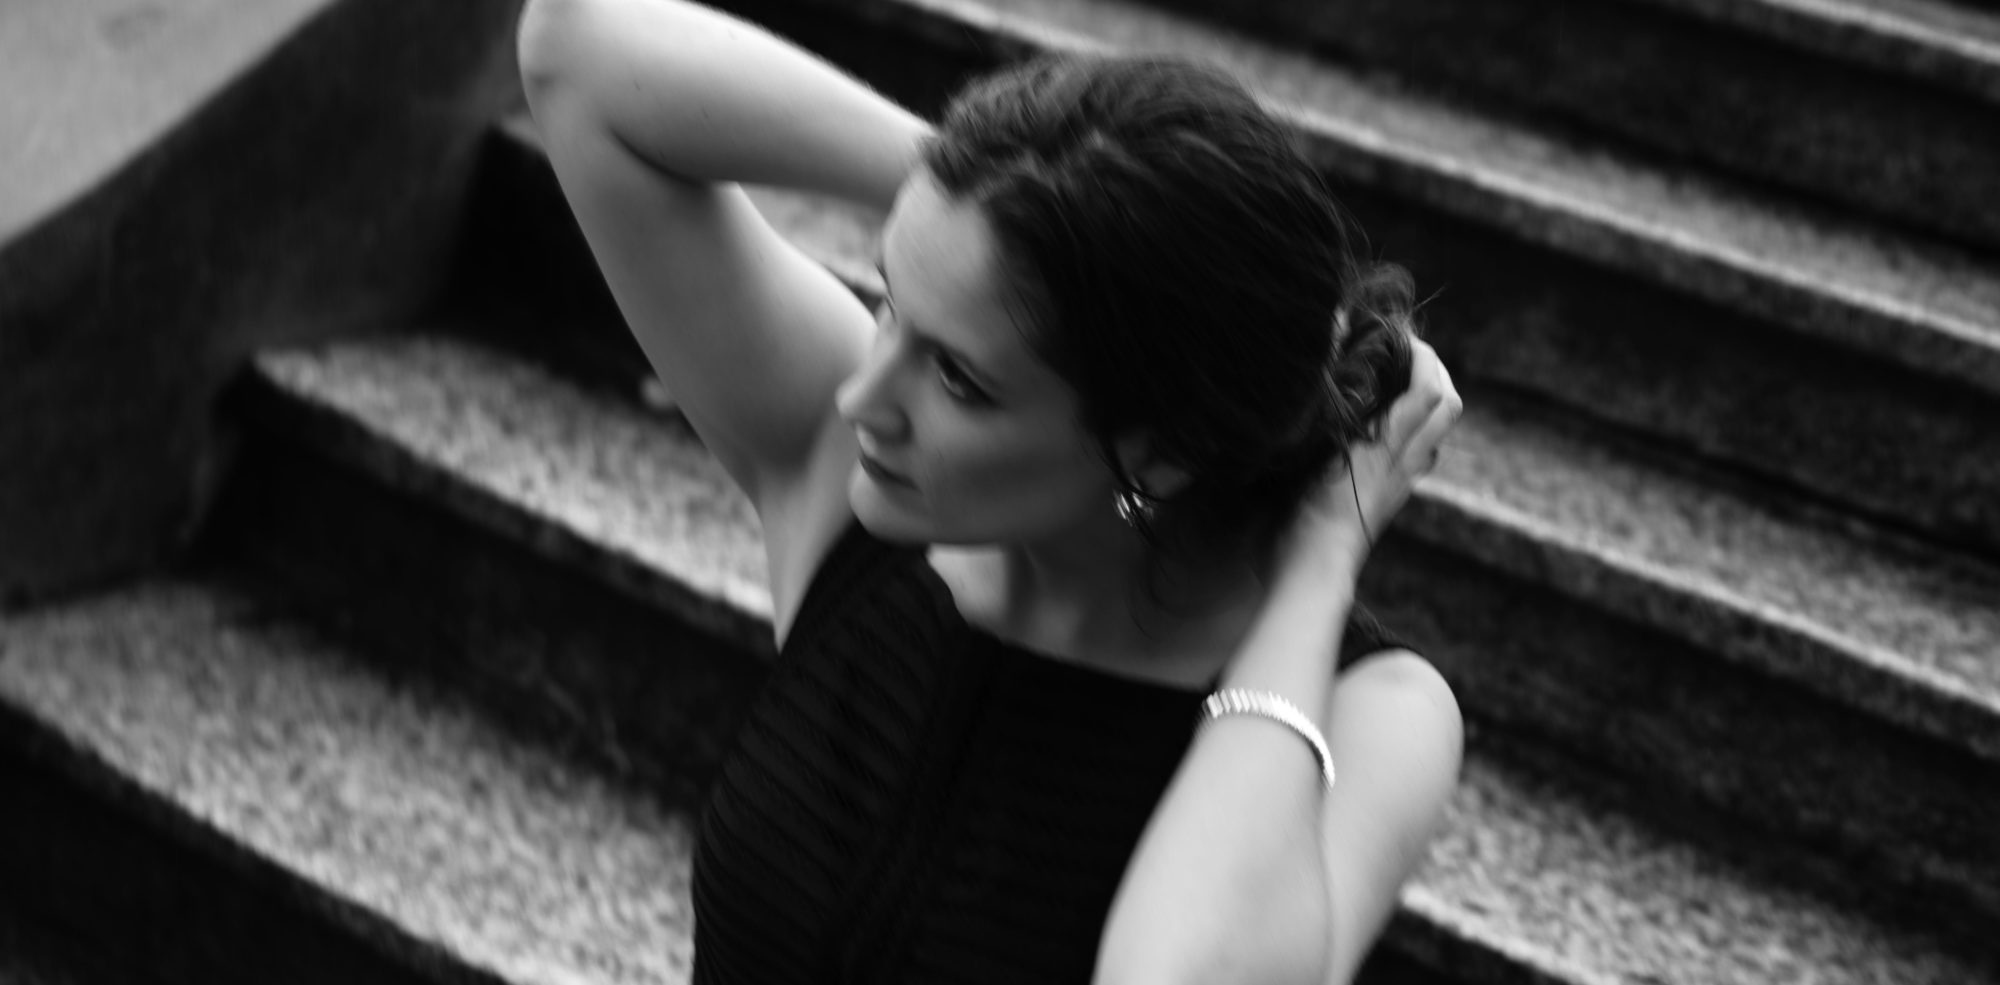 Franziska Andrea Heinzen